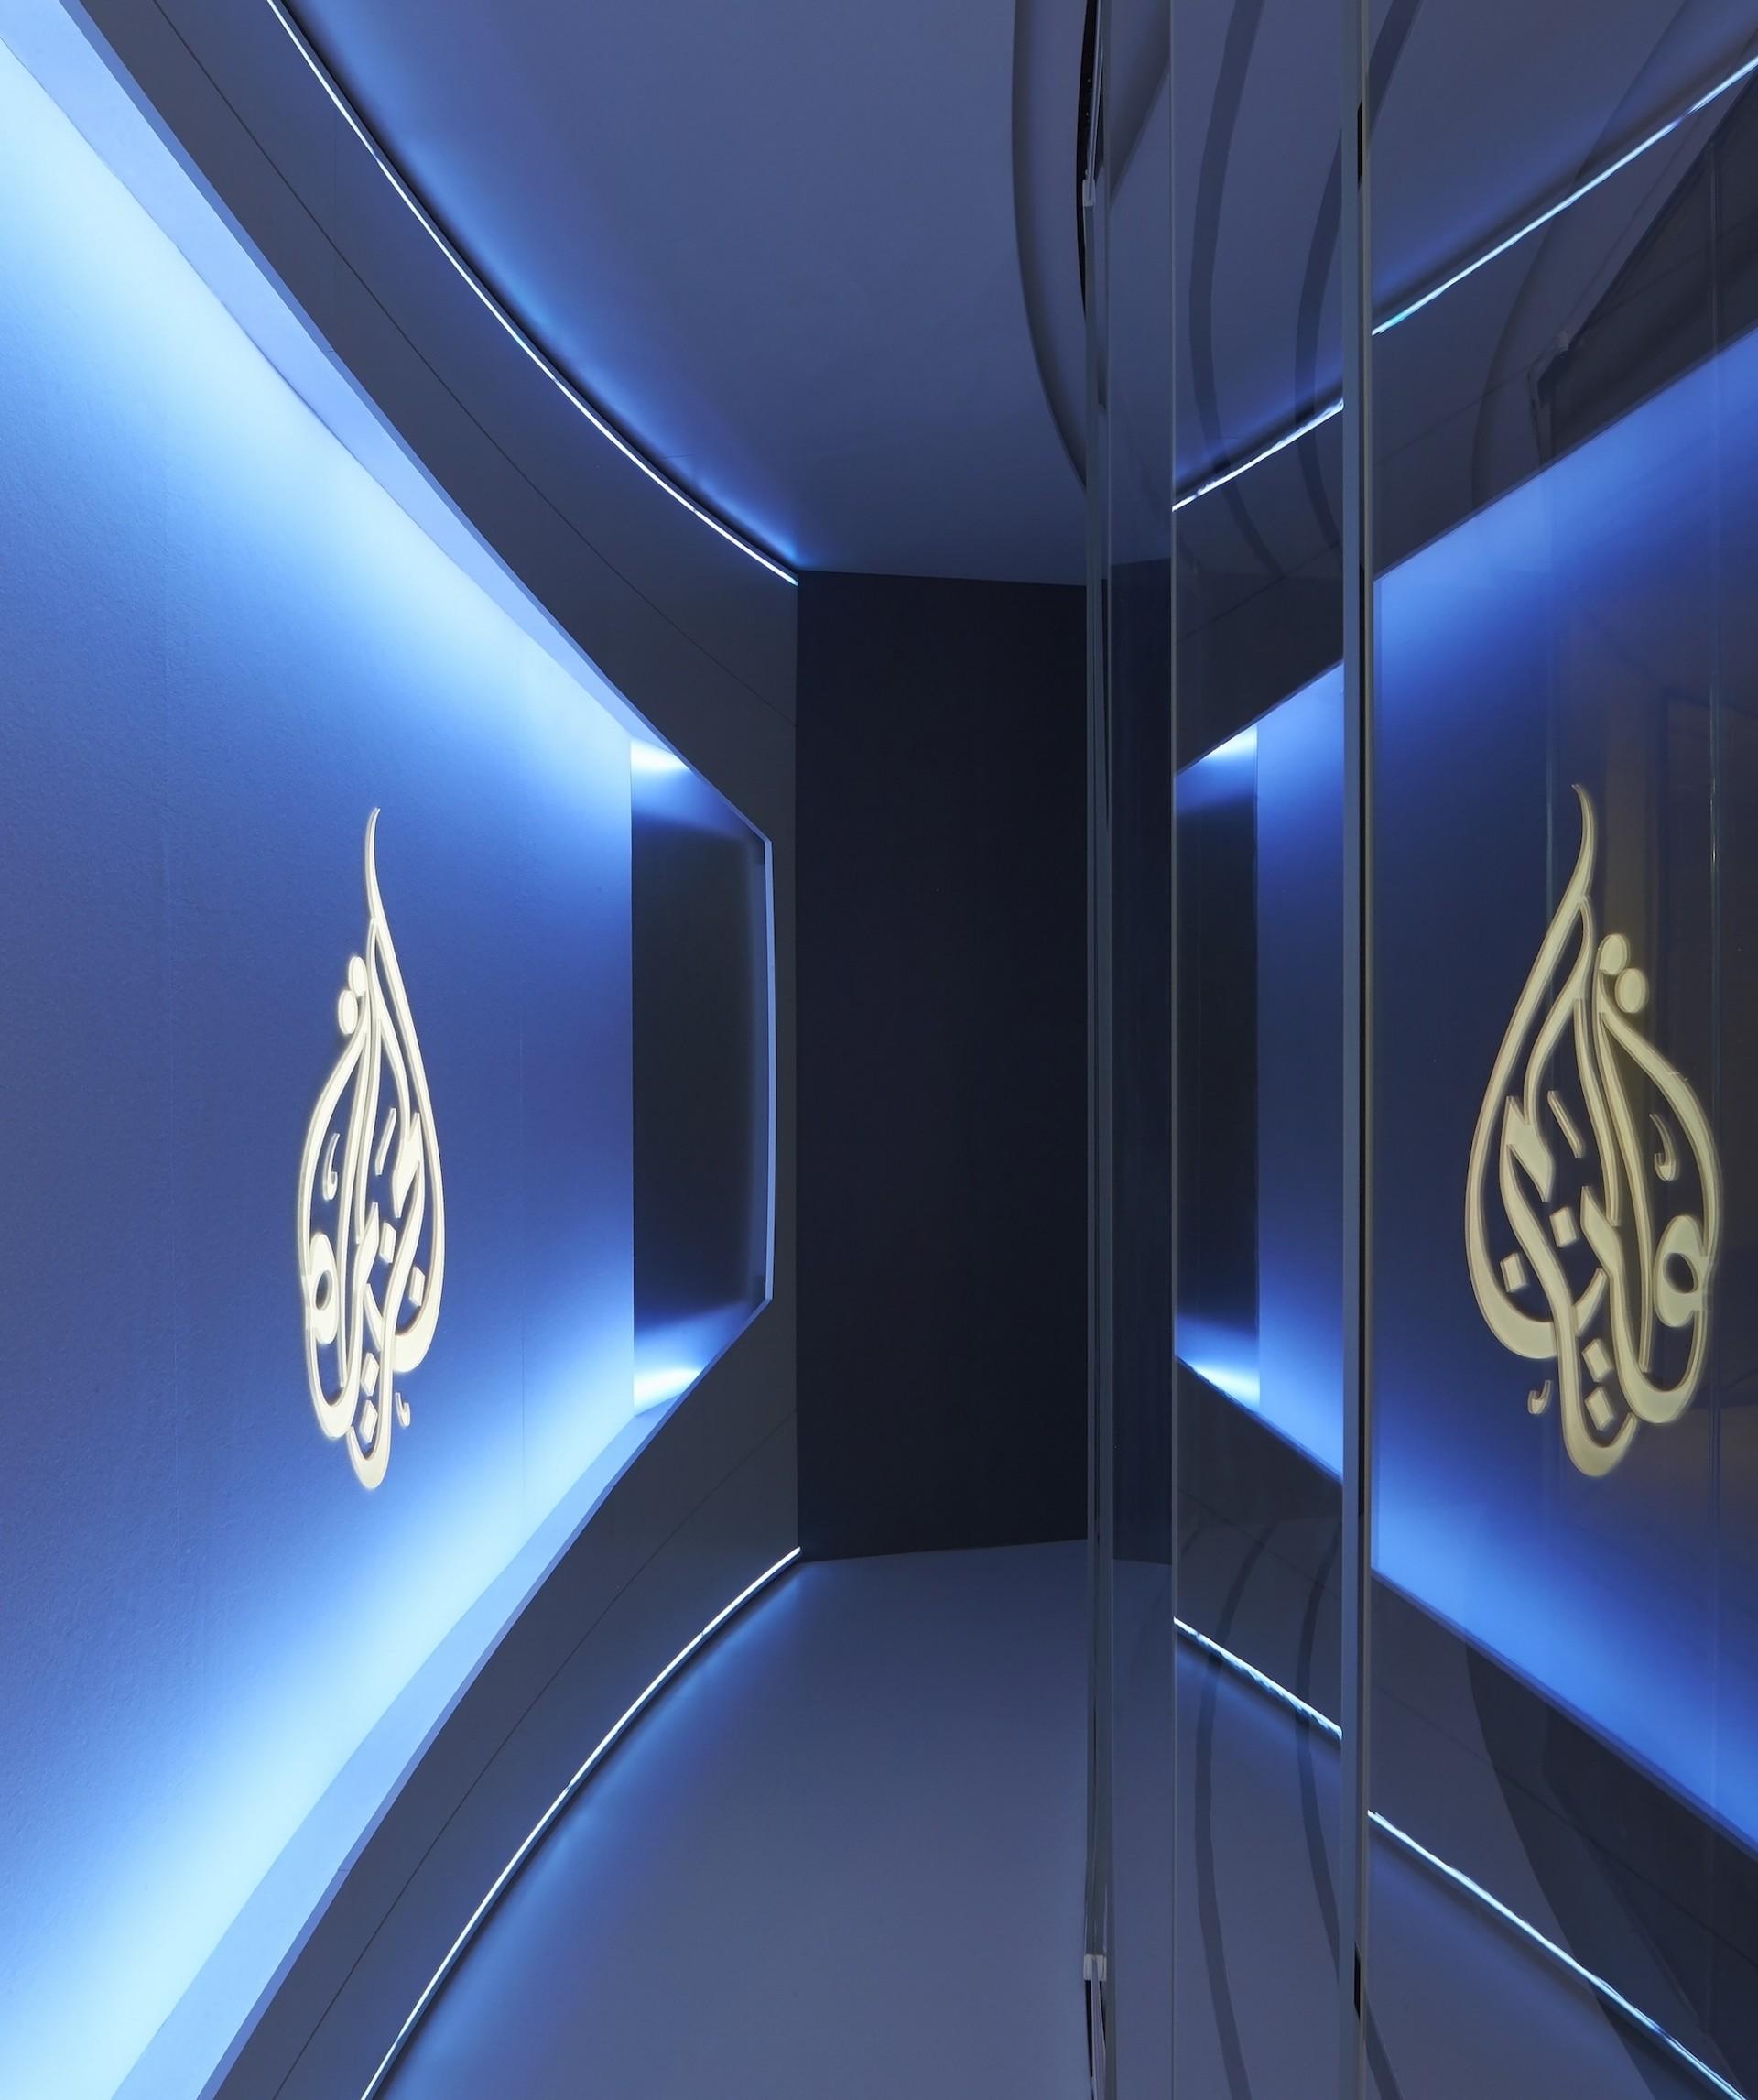 Veech X Veech Al Jazeera Headquarter Doha